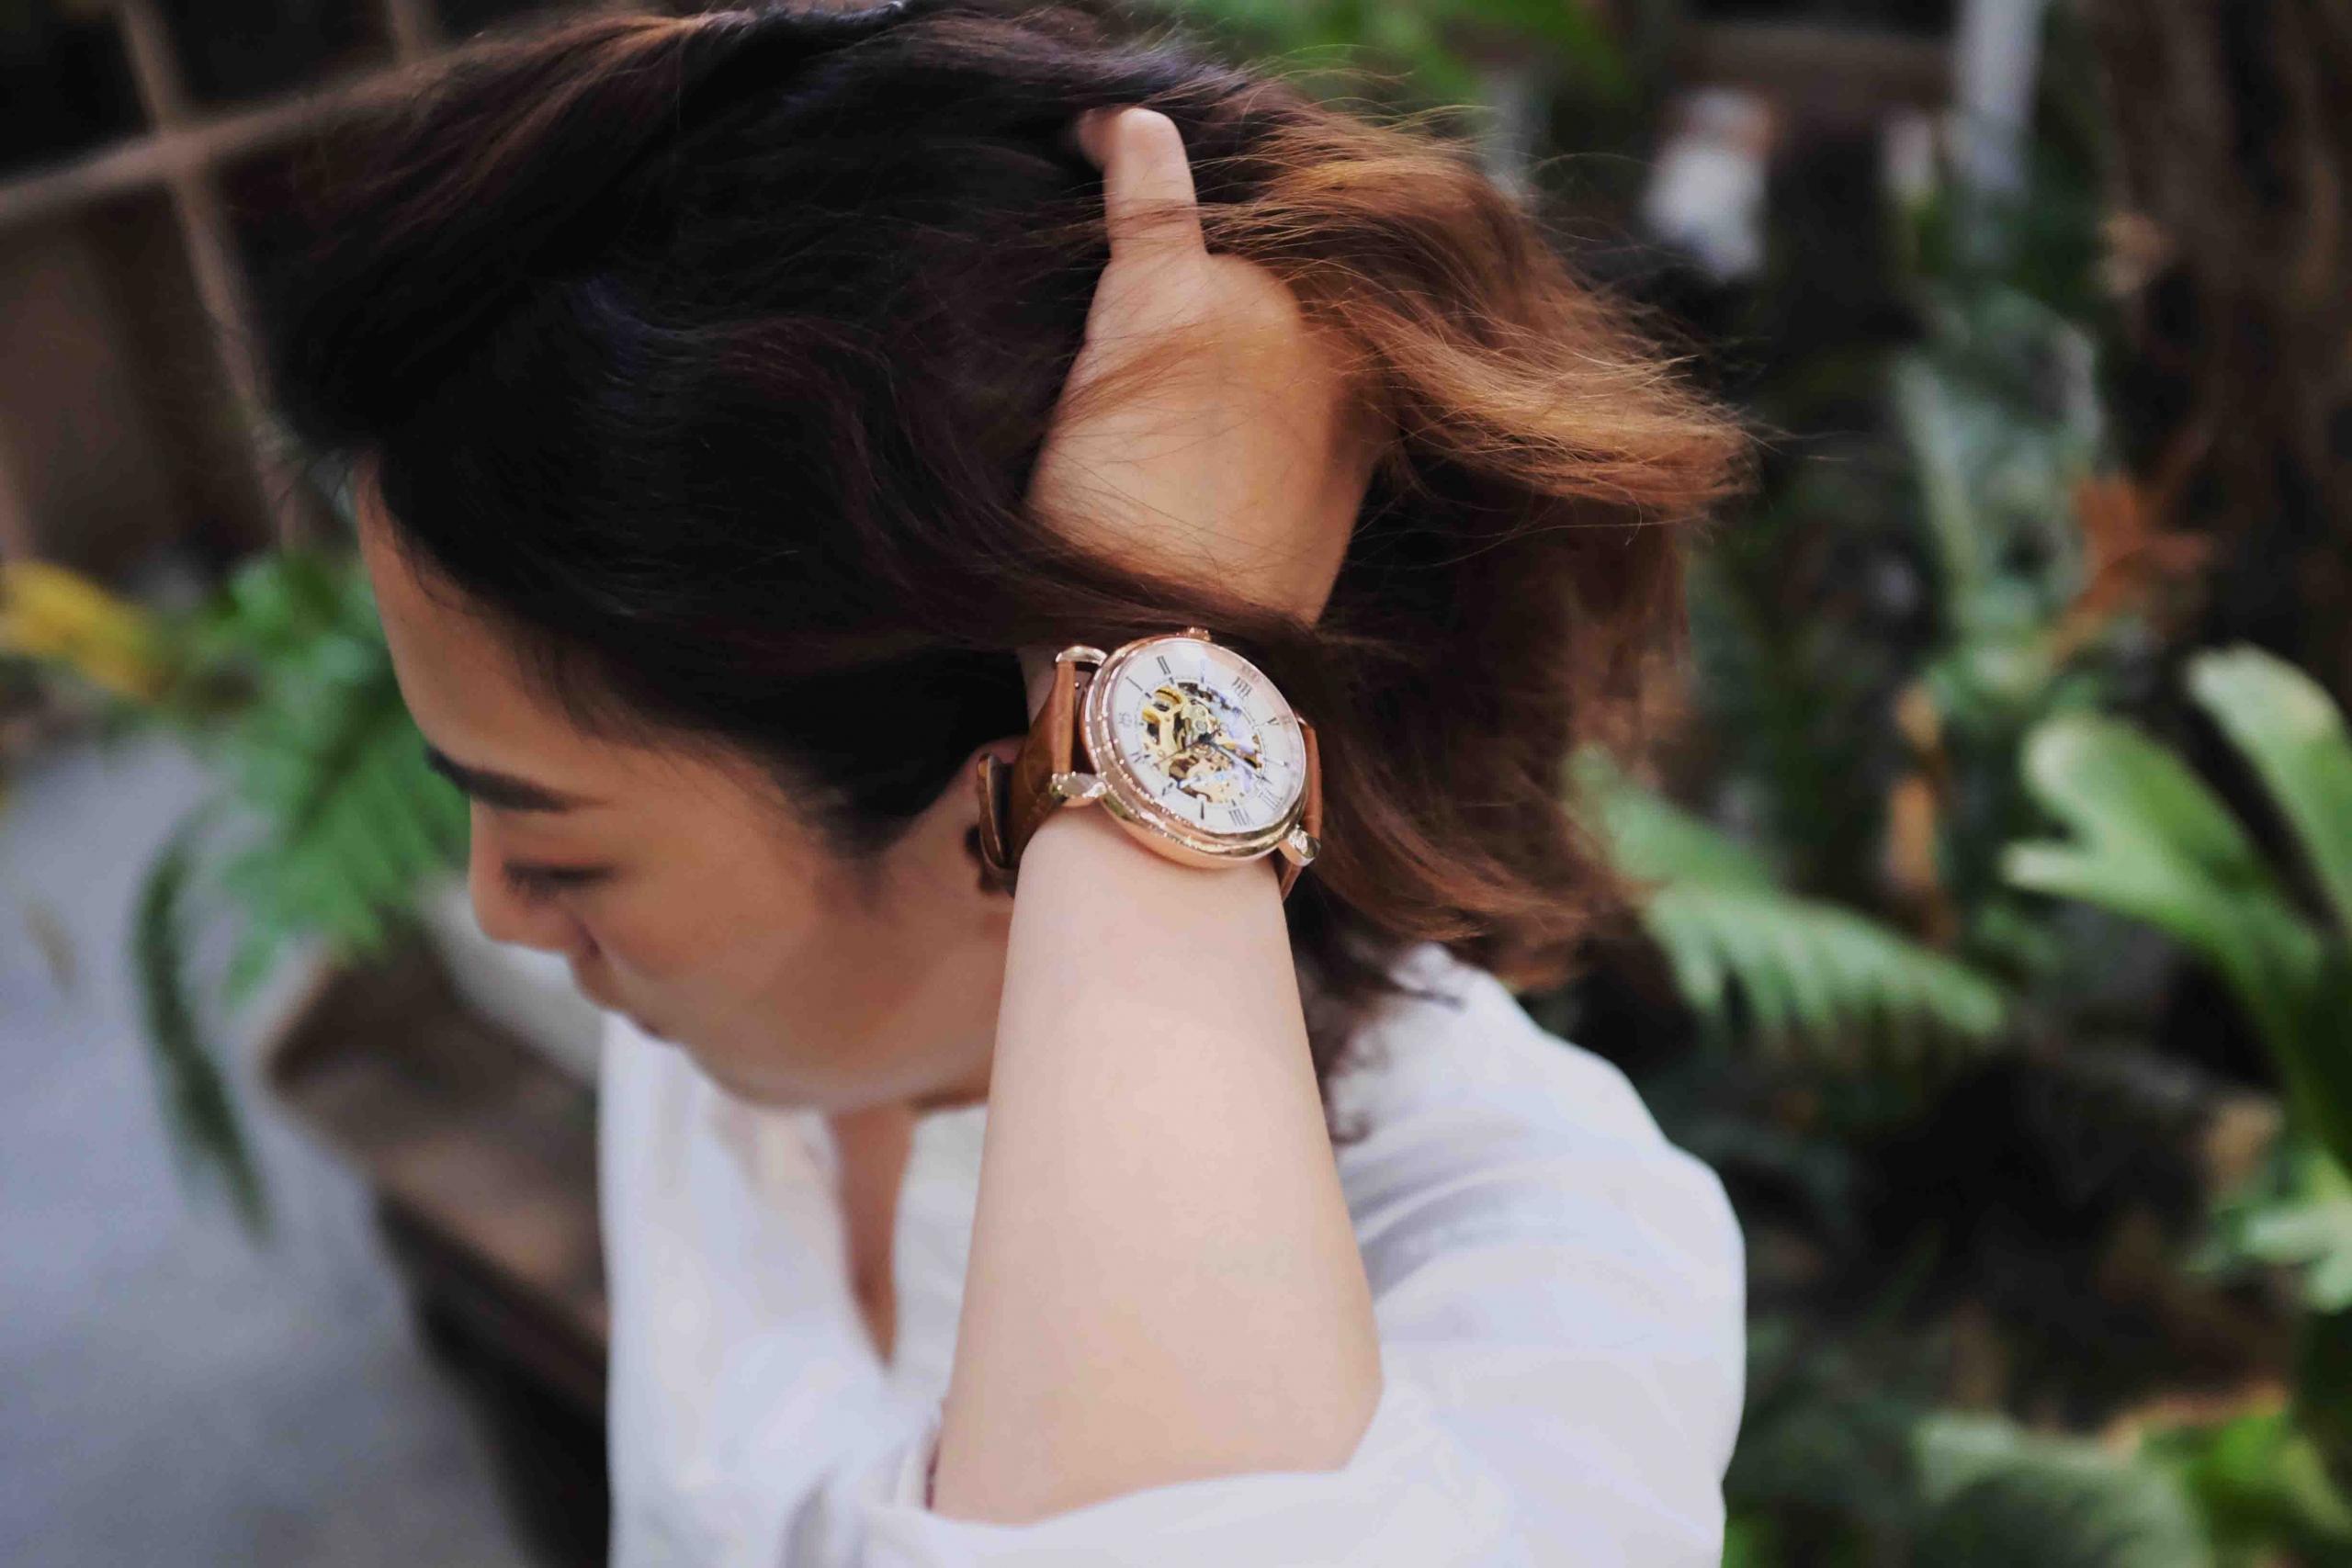 Lobor watches, 機械錶, 情侶對錶, 香港品牌